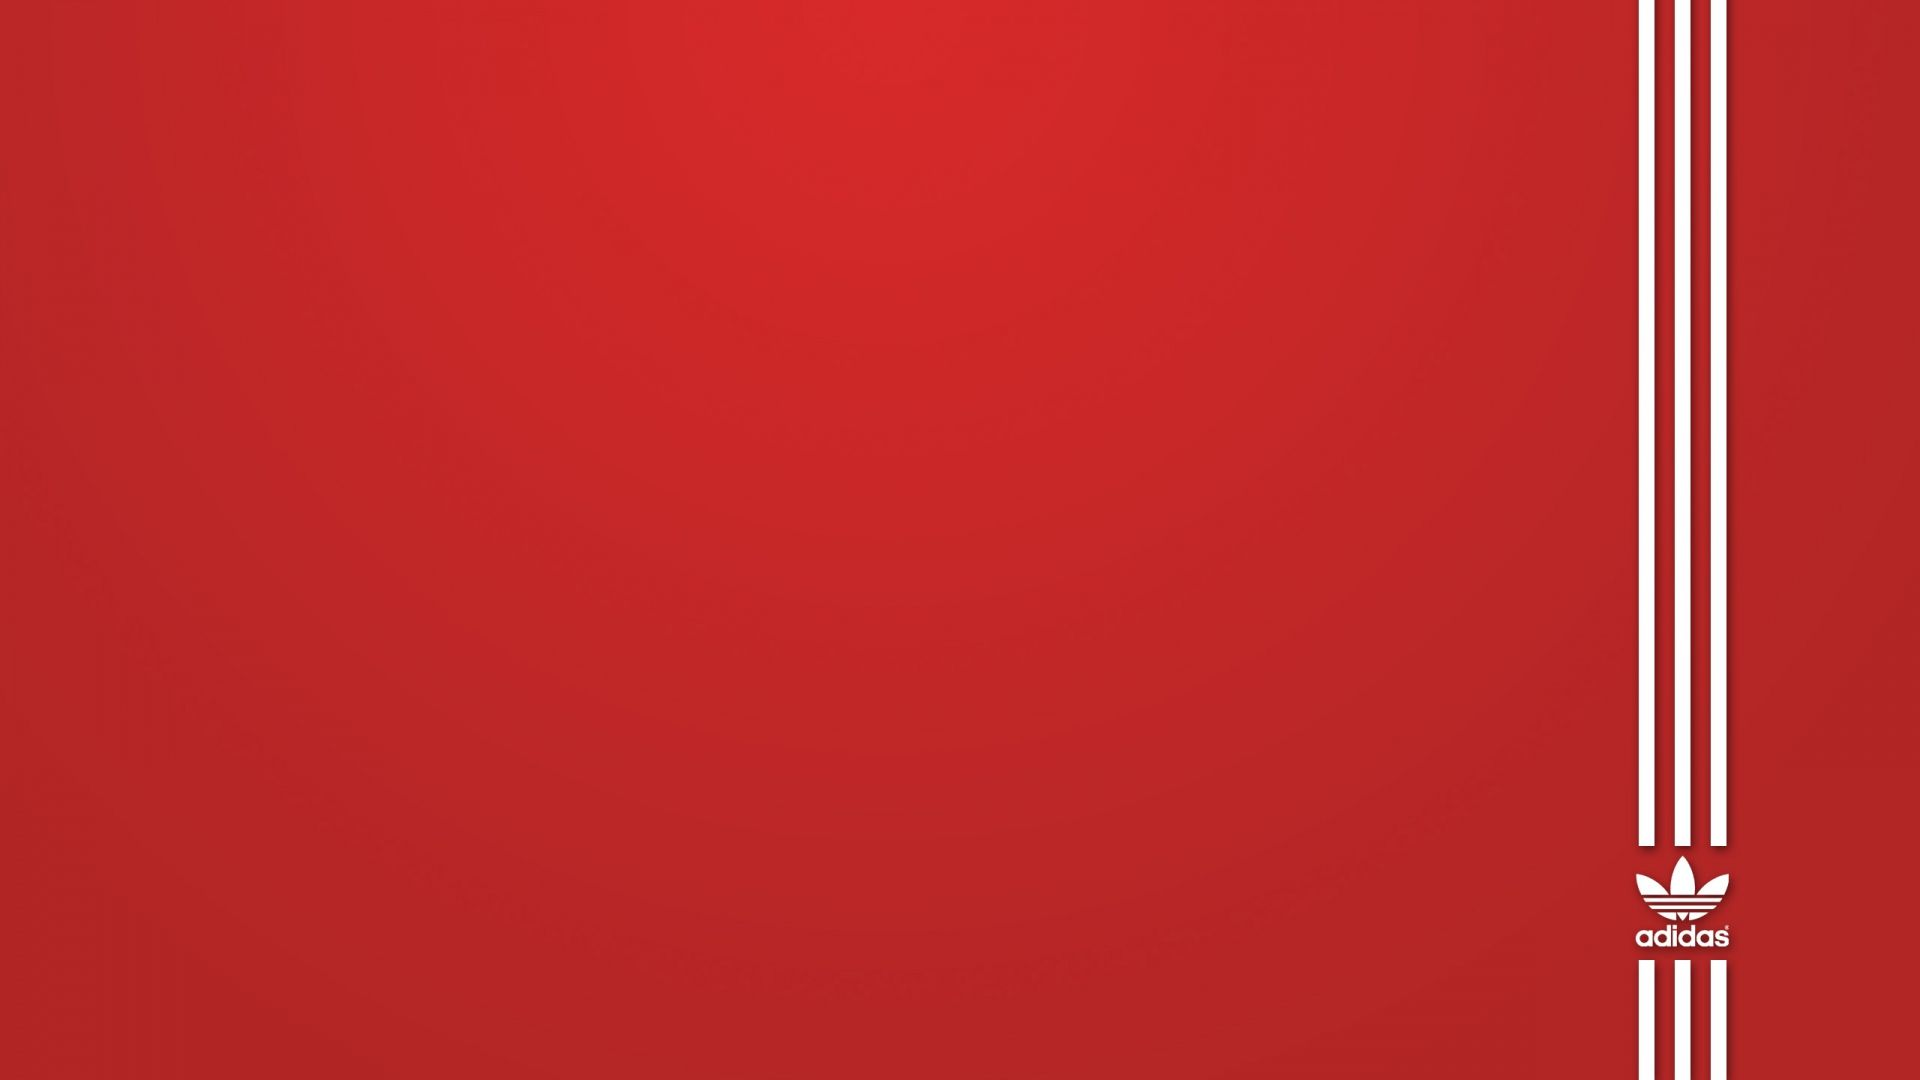 brand adidas red white sport hd wallpaper